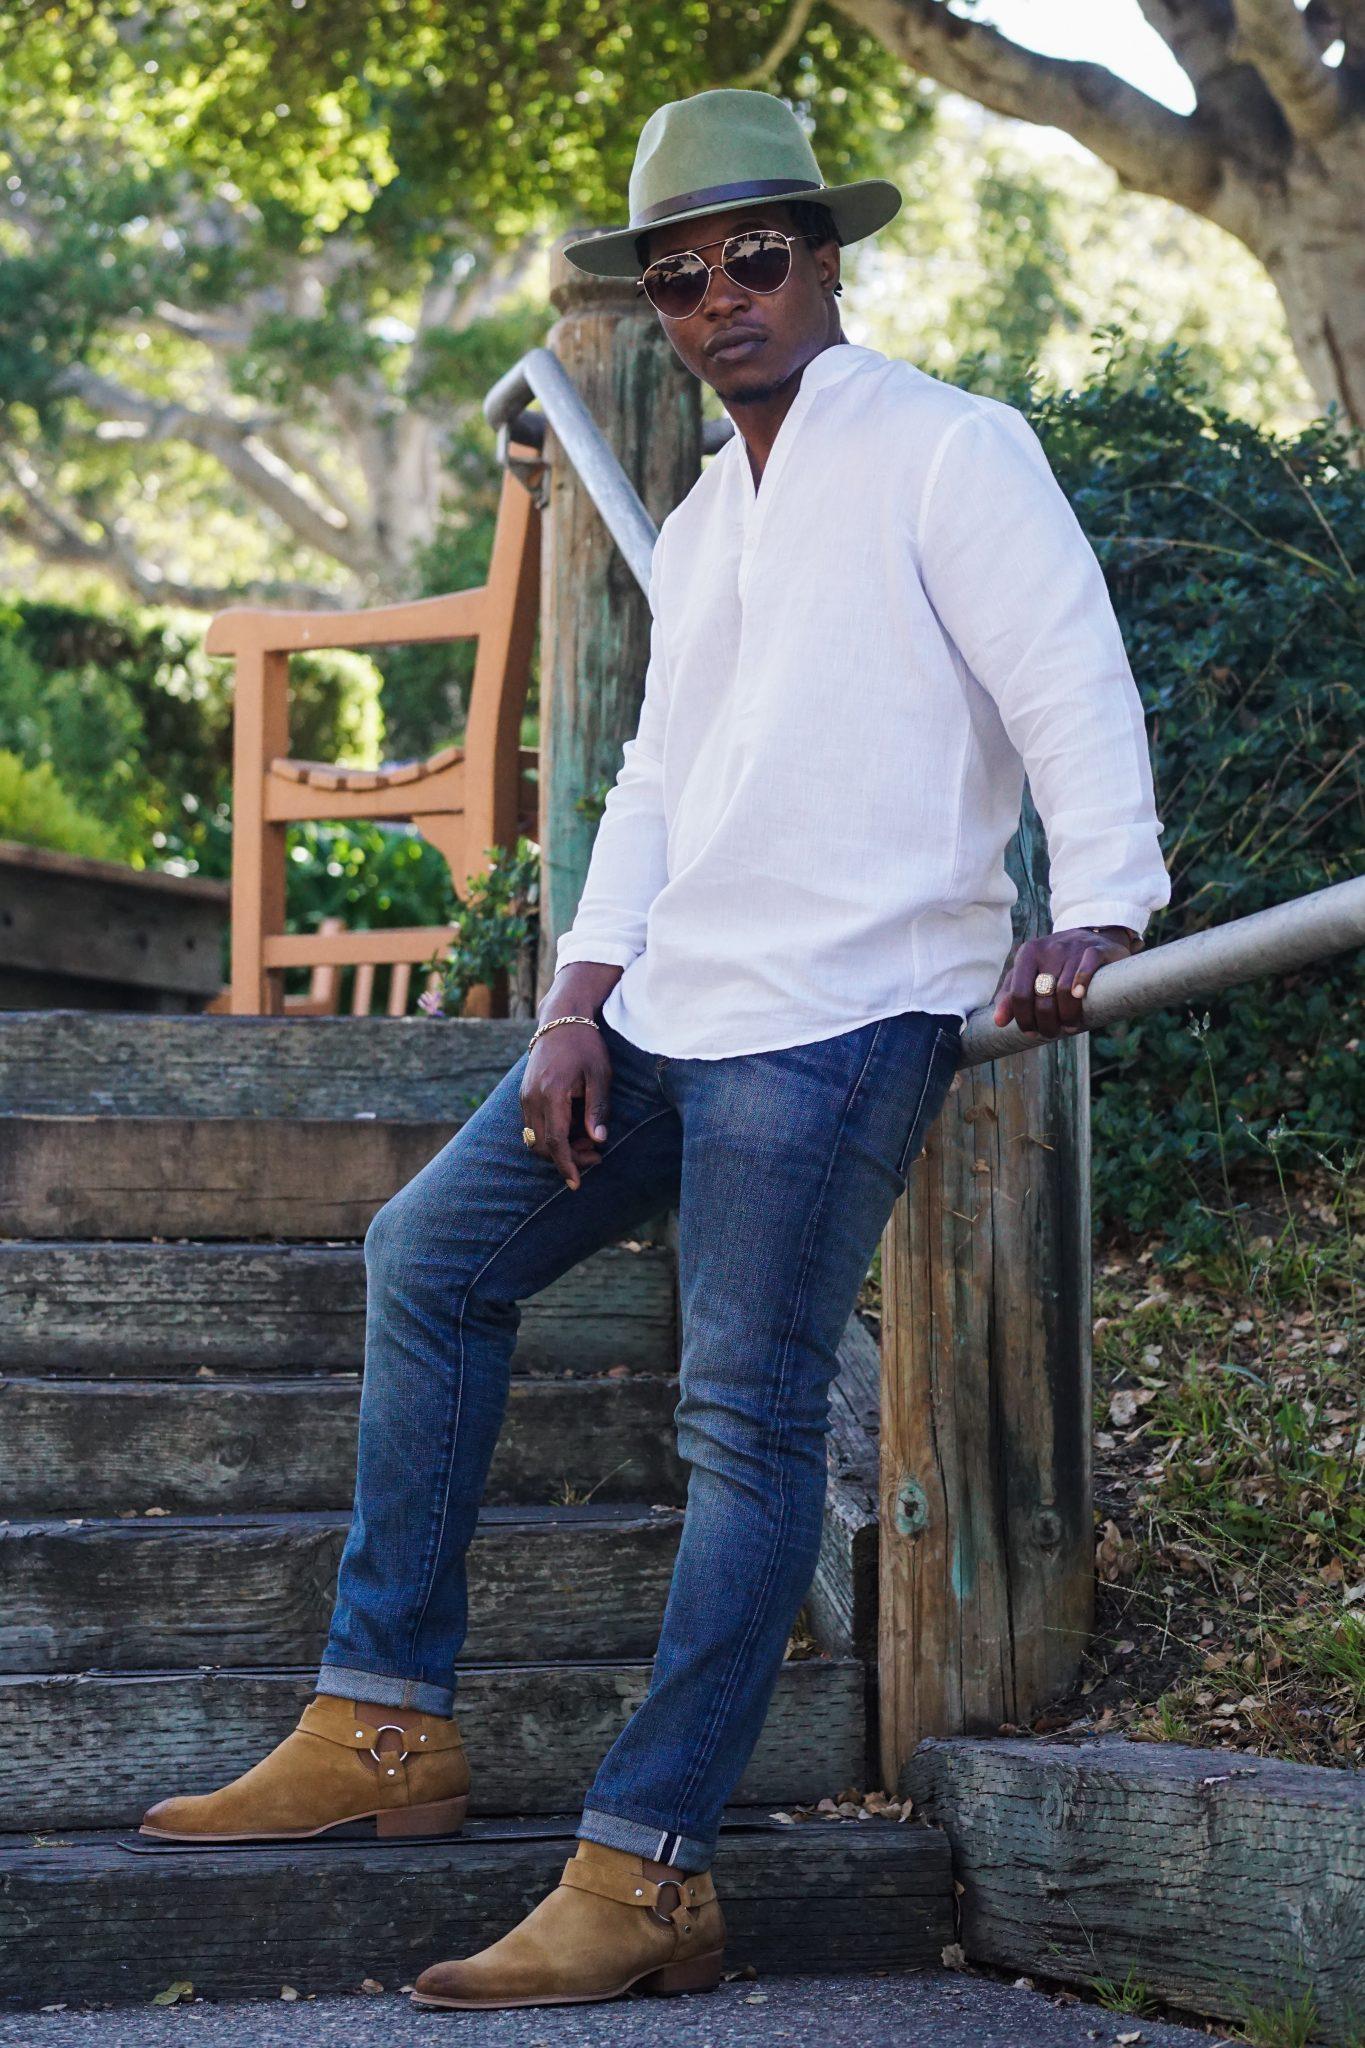 7af6ce86651a9 Black man wearing-linen-shirt-southern gents-fedora-hats-brown